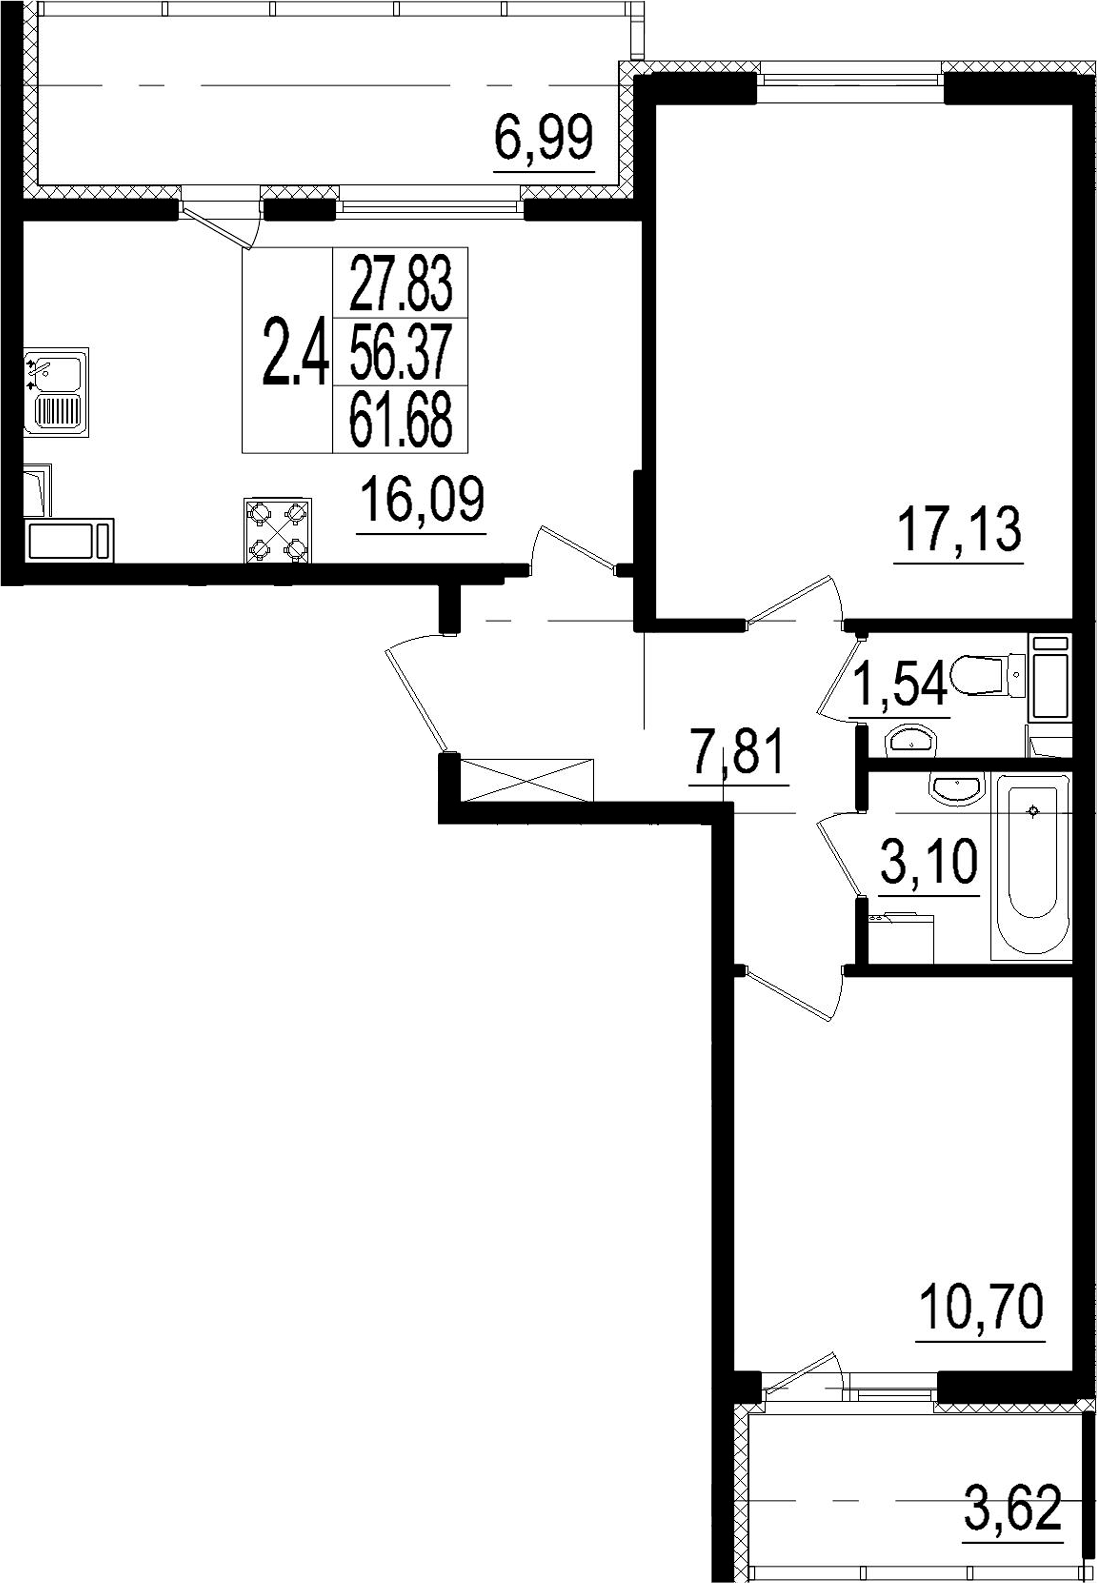 3Е-к.кв, 56.37 м²